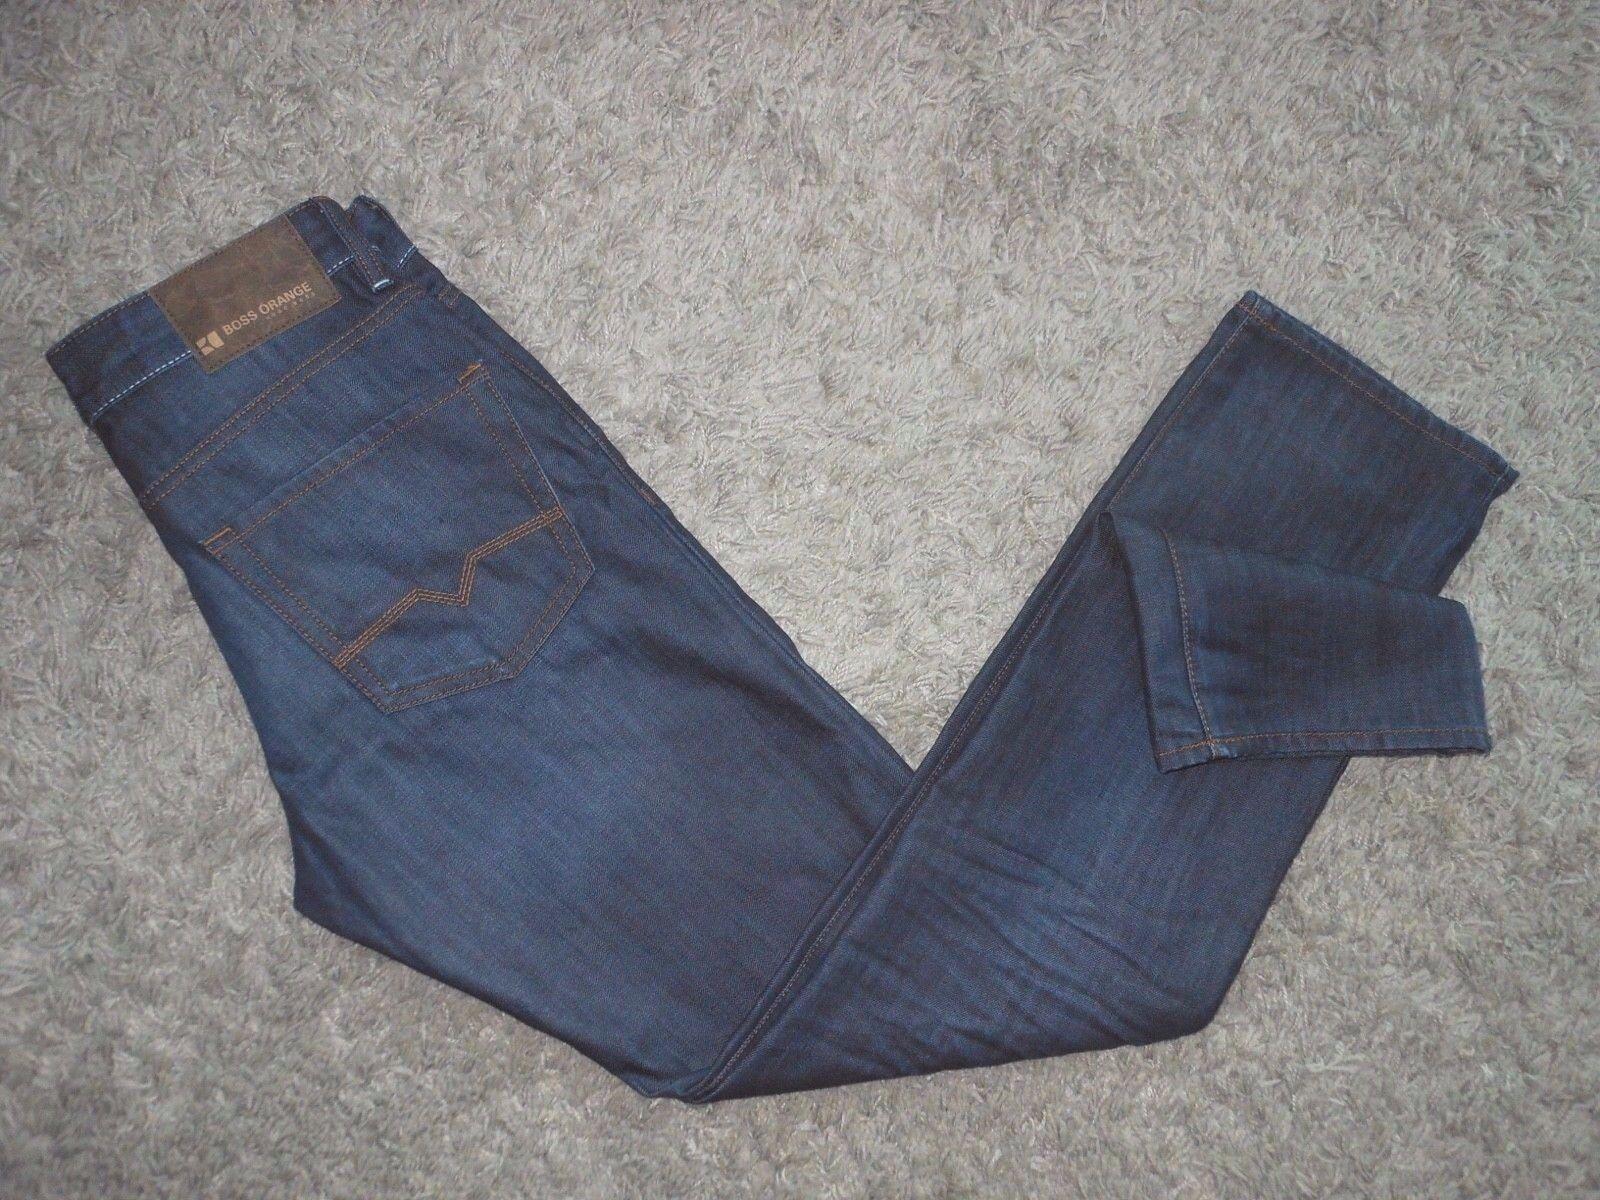 NEW Mens Hugo BOSS orange25 Moonlight Regular Fit Jeans - Size 31x34